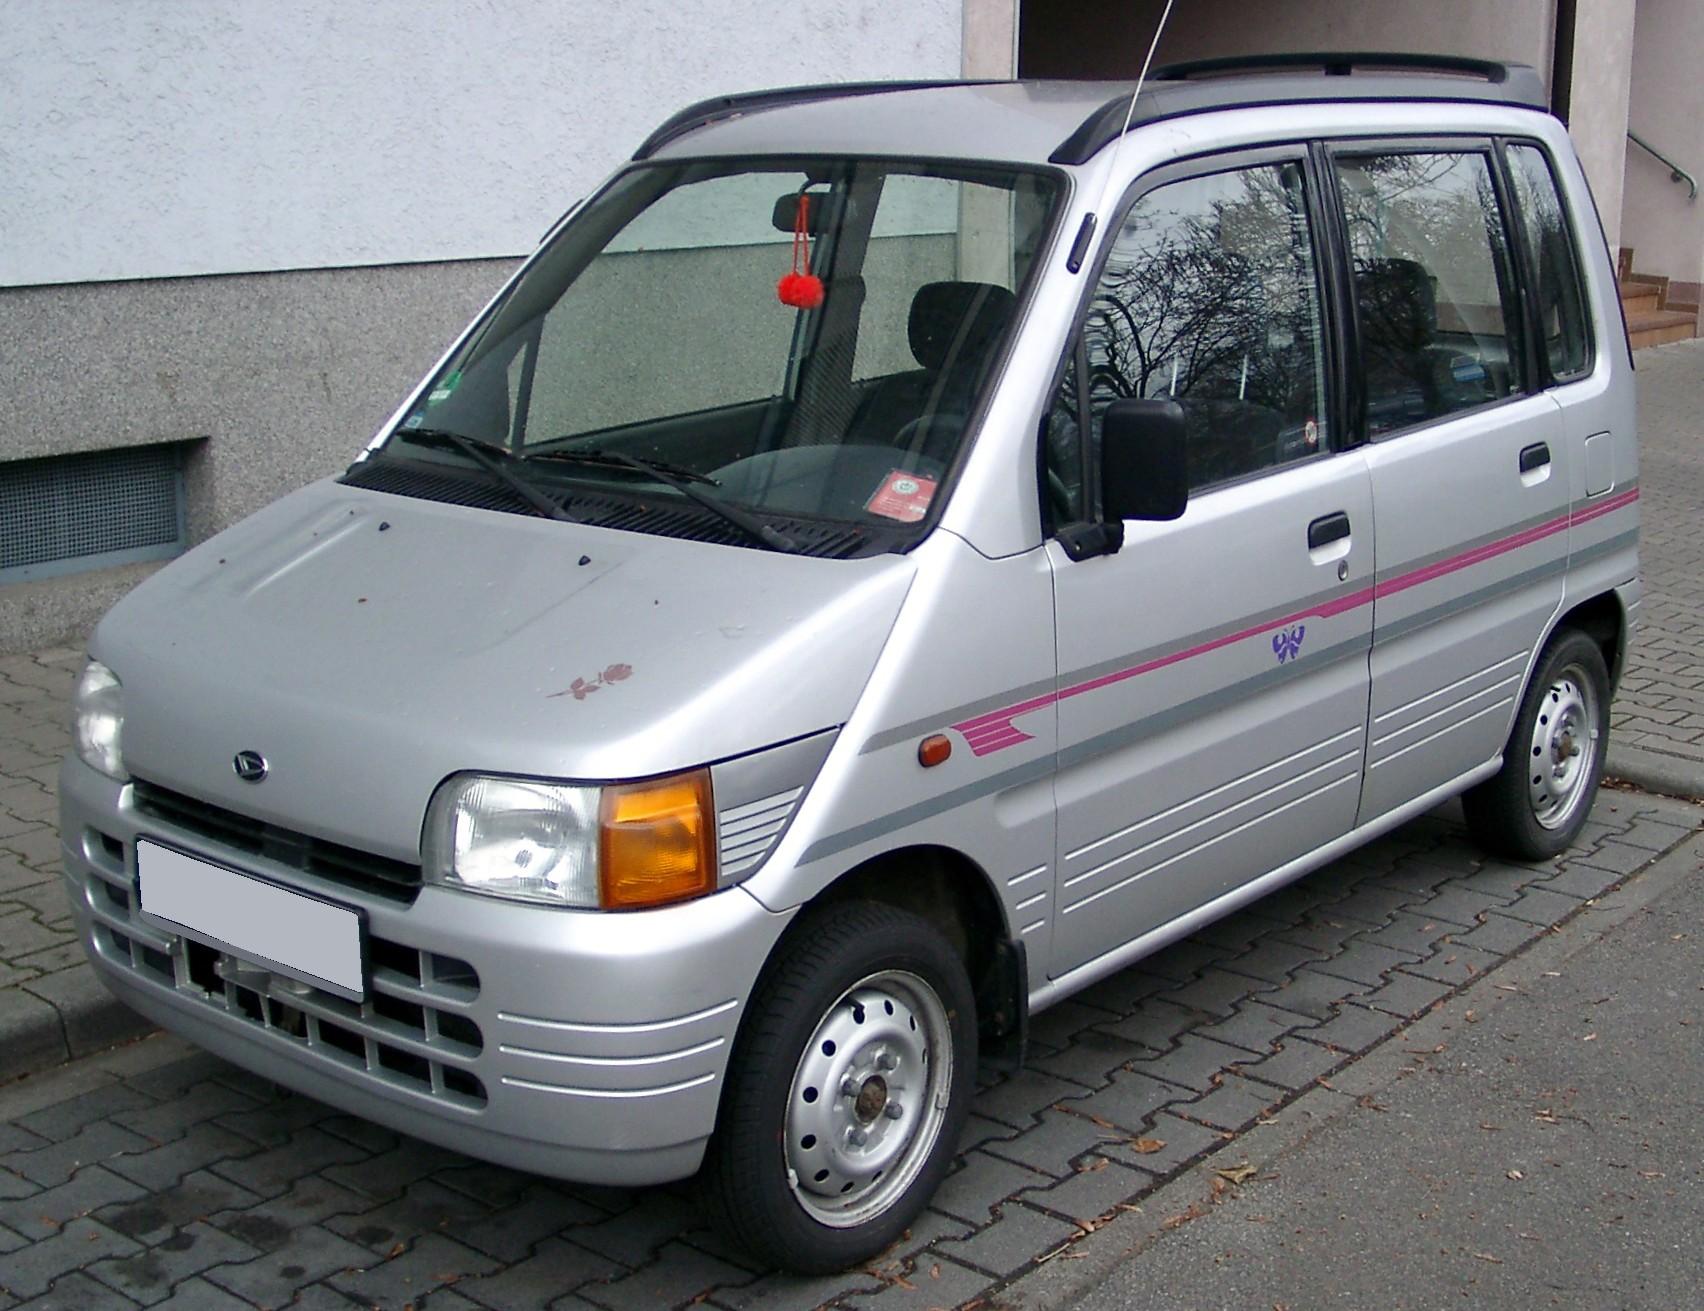 Daihatsu Move Pictures